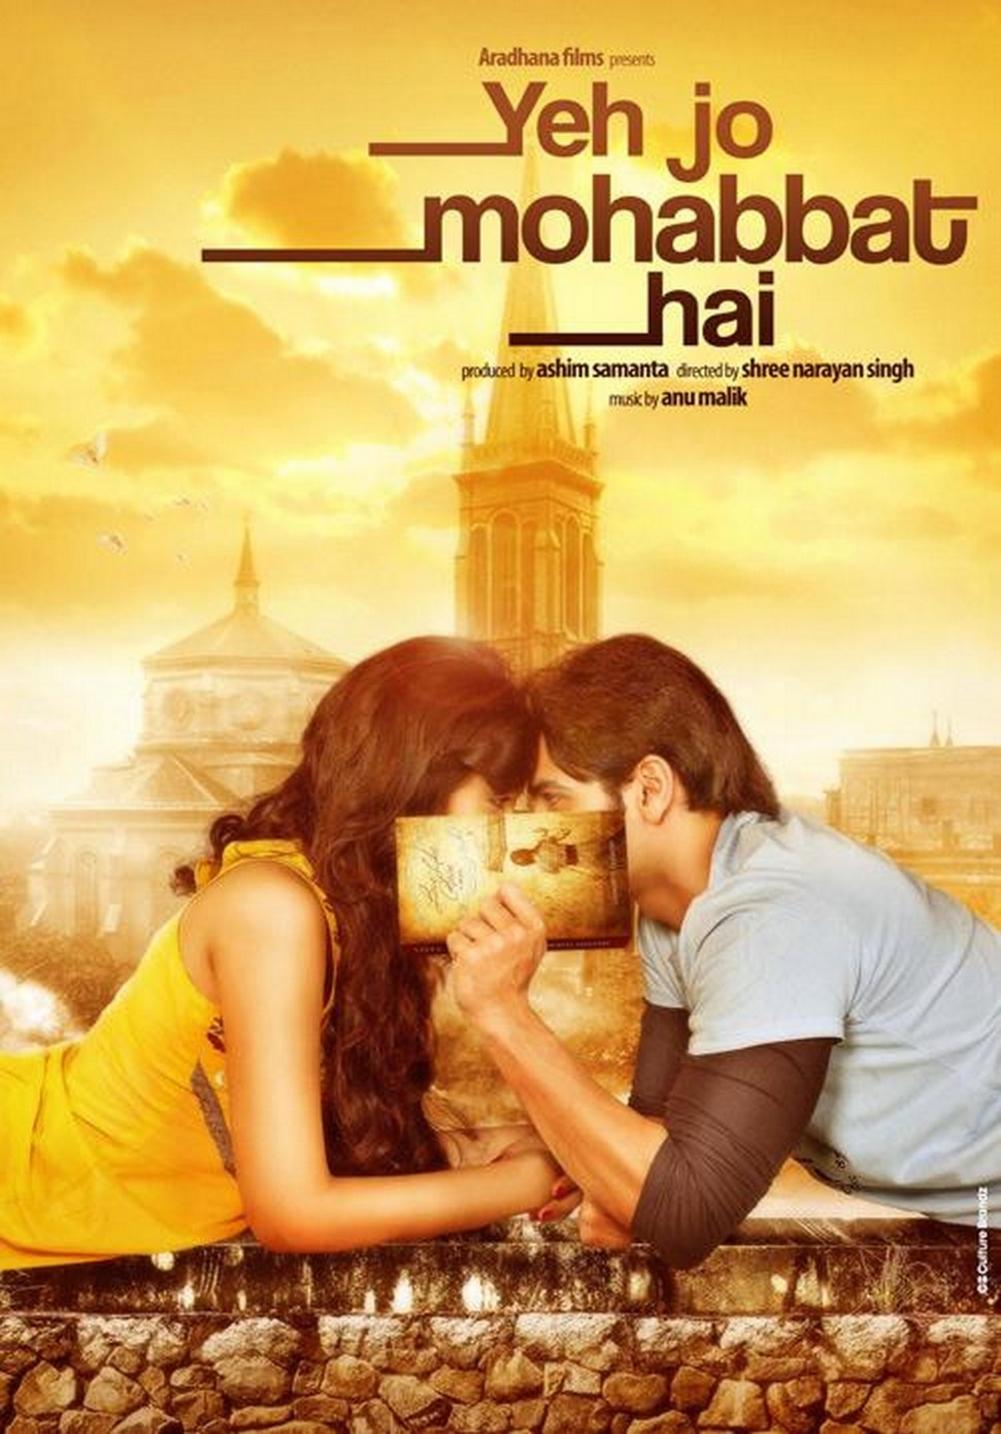 Yeh Jo Mohabbat Hai - Movie Poster #1 (Original)